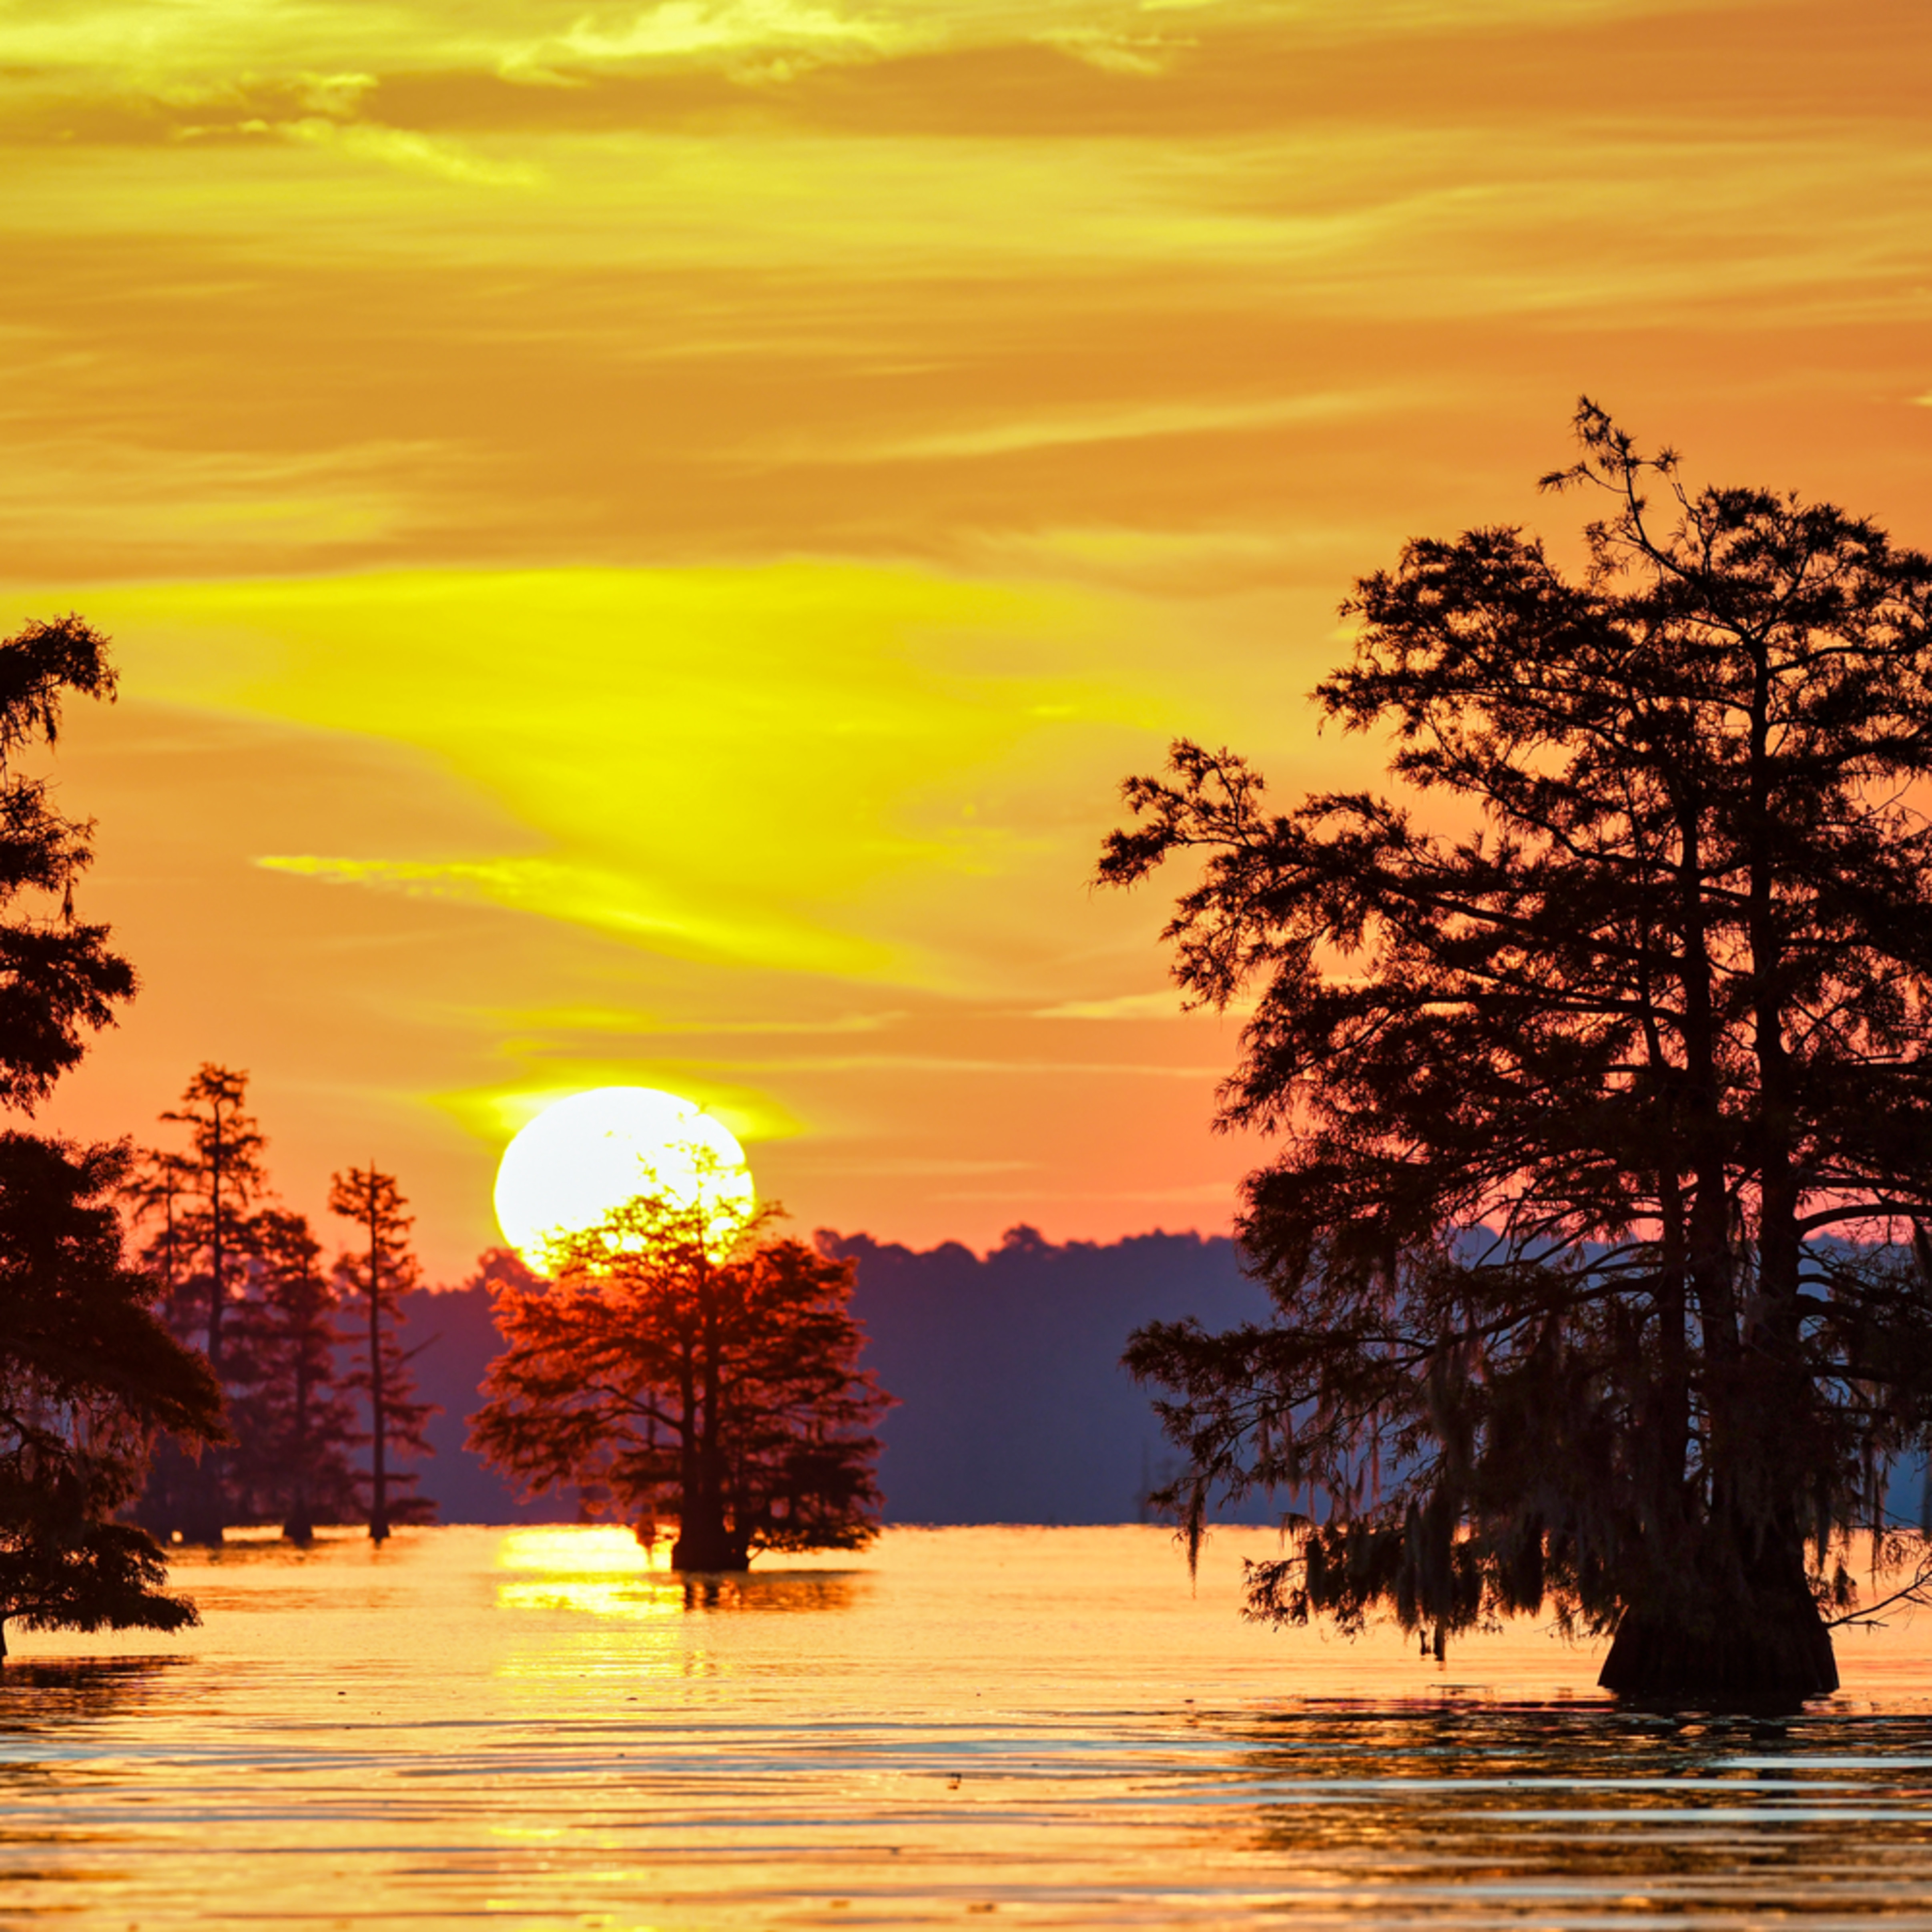 Andy crawford photography lake marion sunrise 01 izhgjh